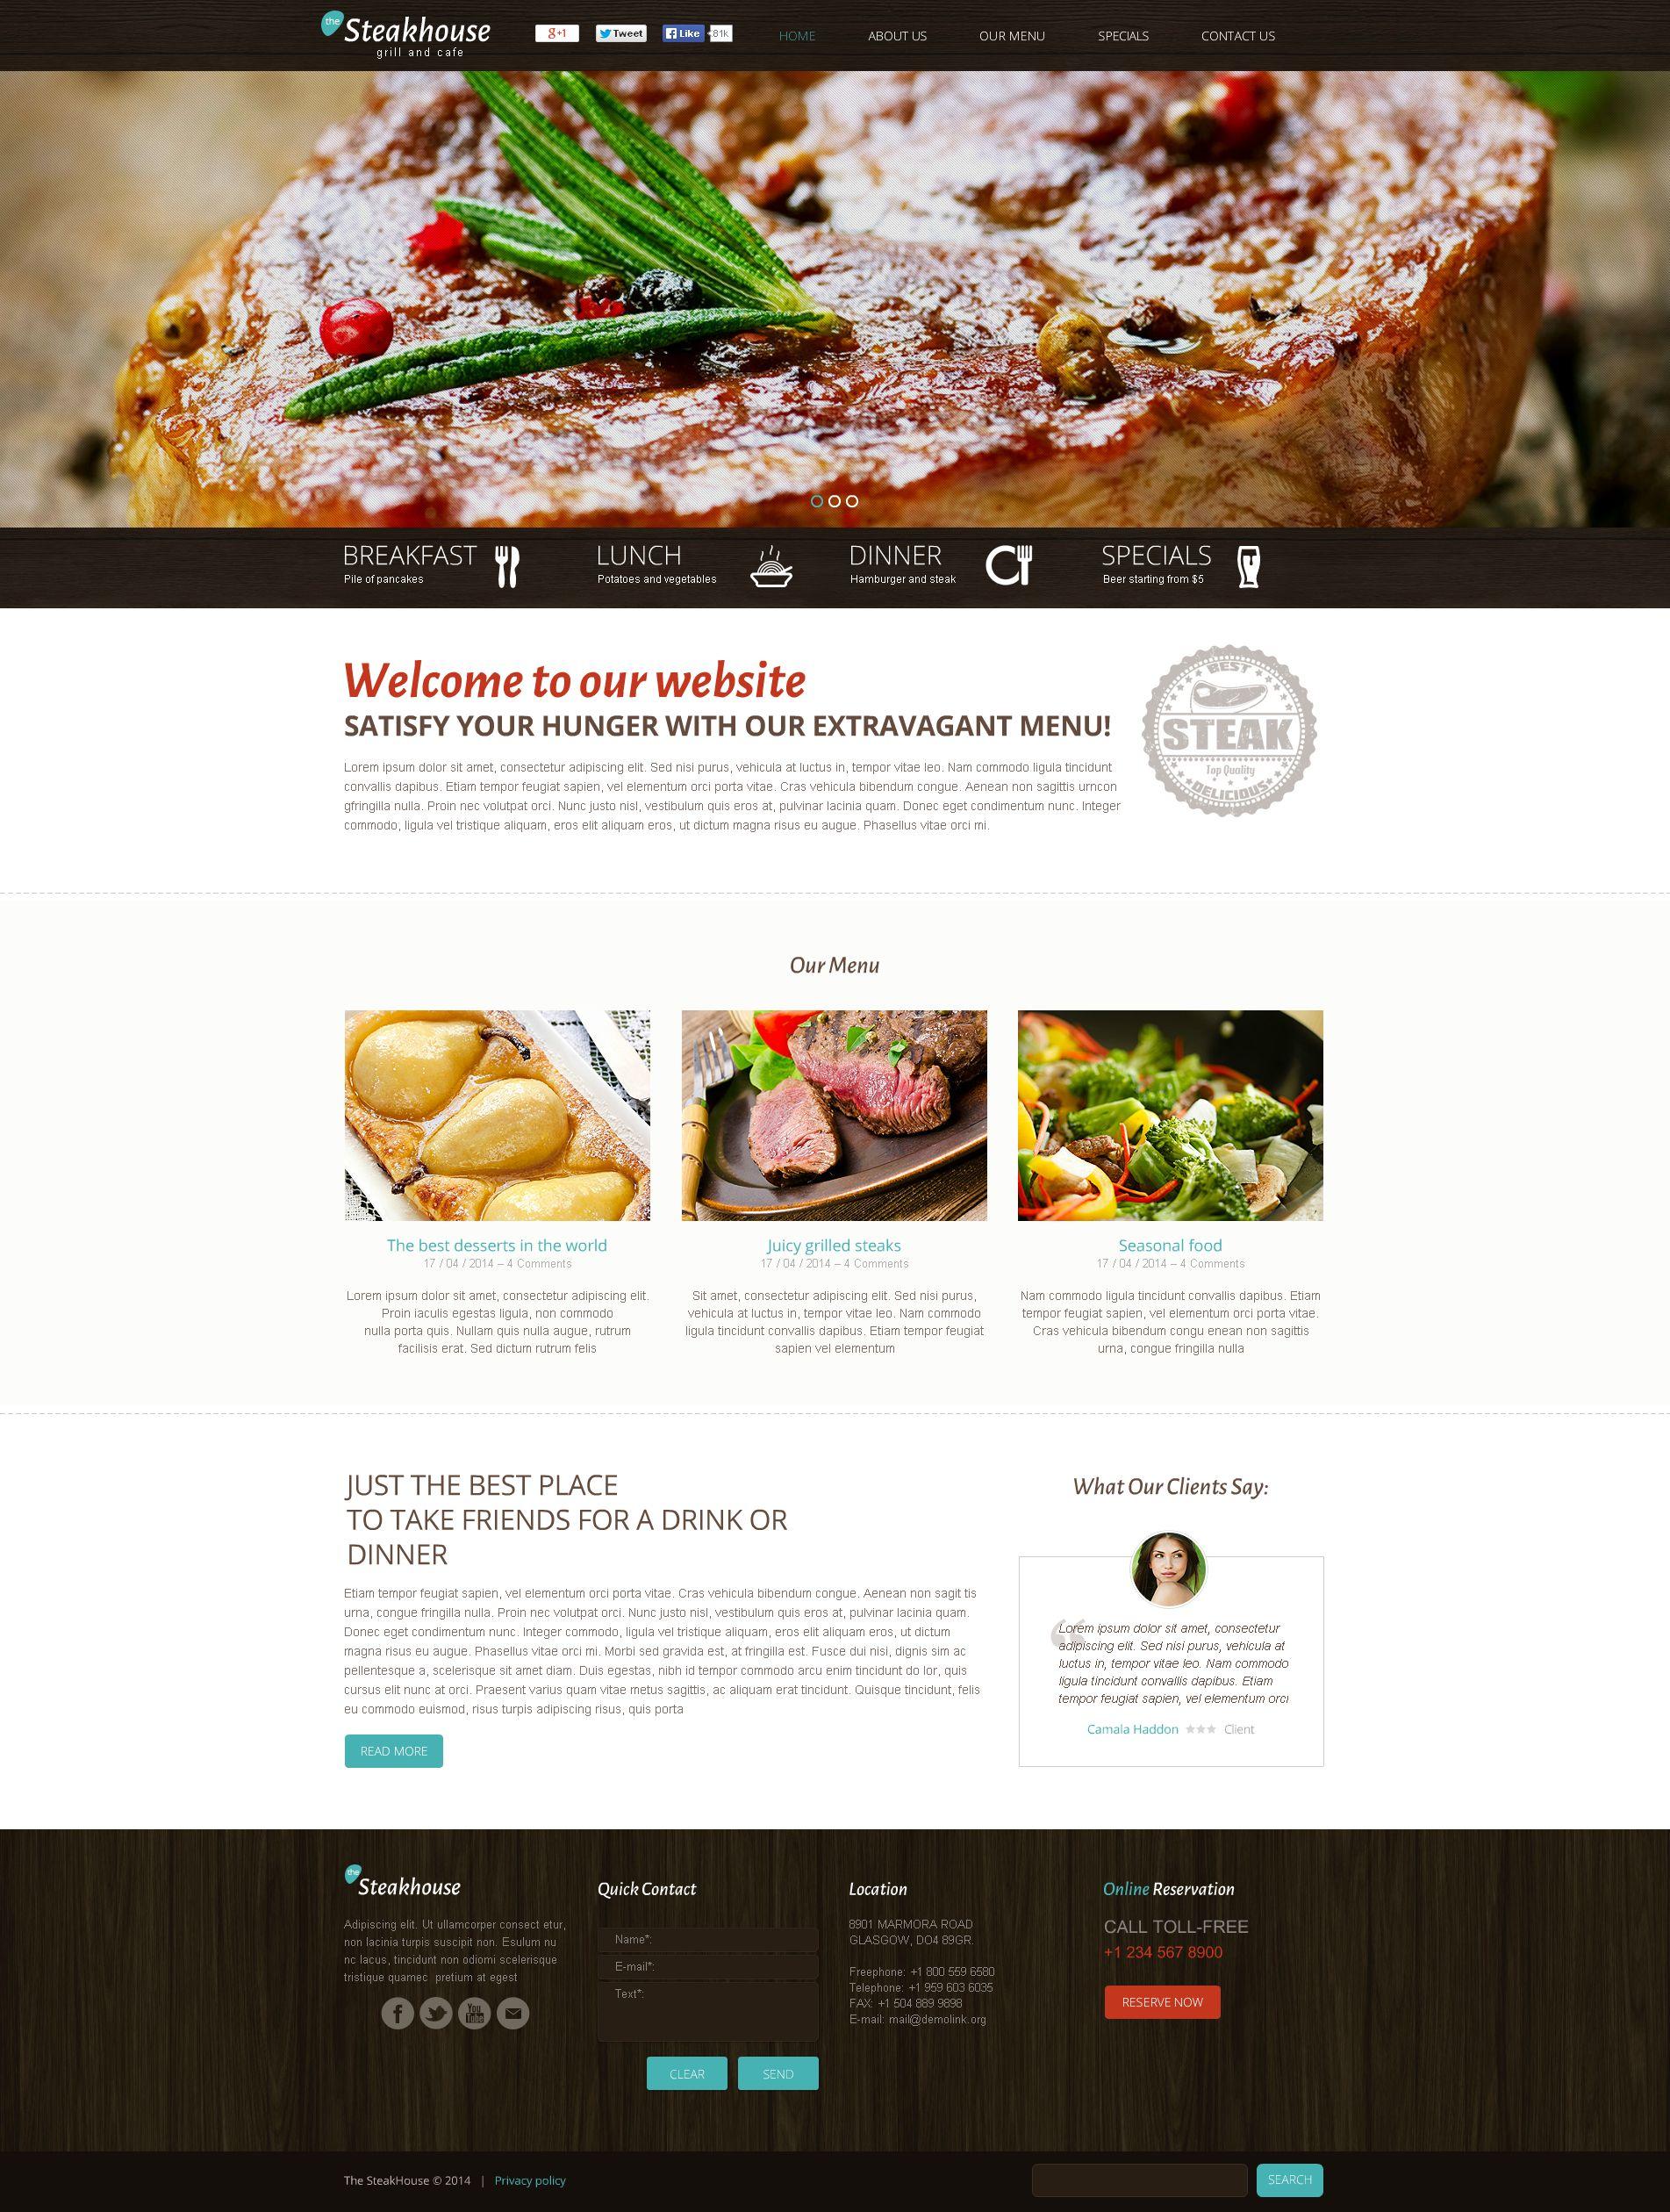 Szablon Flash CMS #50660 na temat: restauracja amerykańska - zrzut ekranu